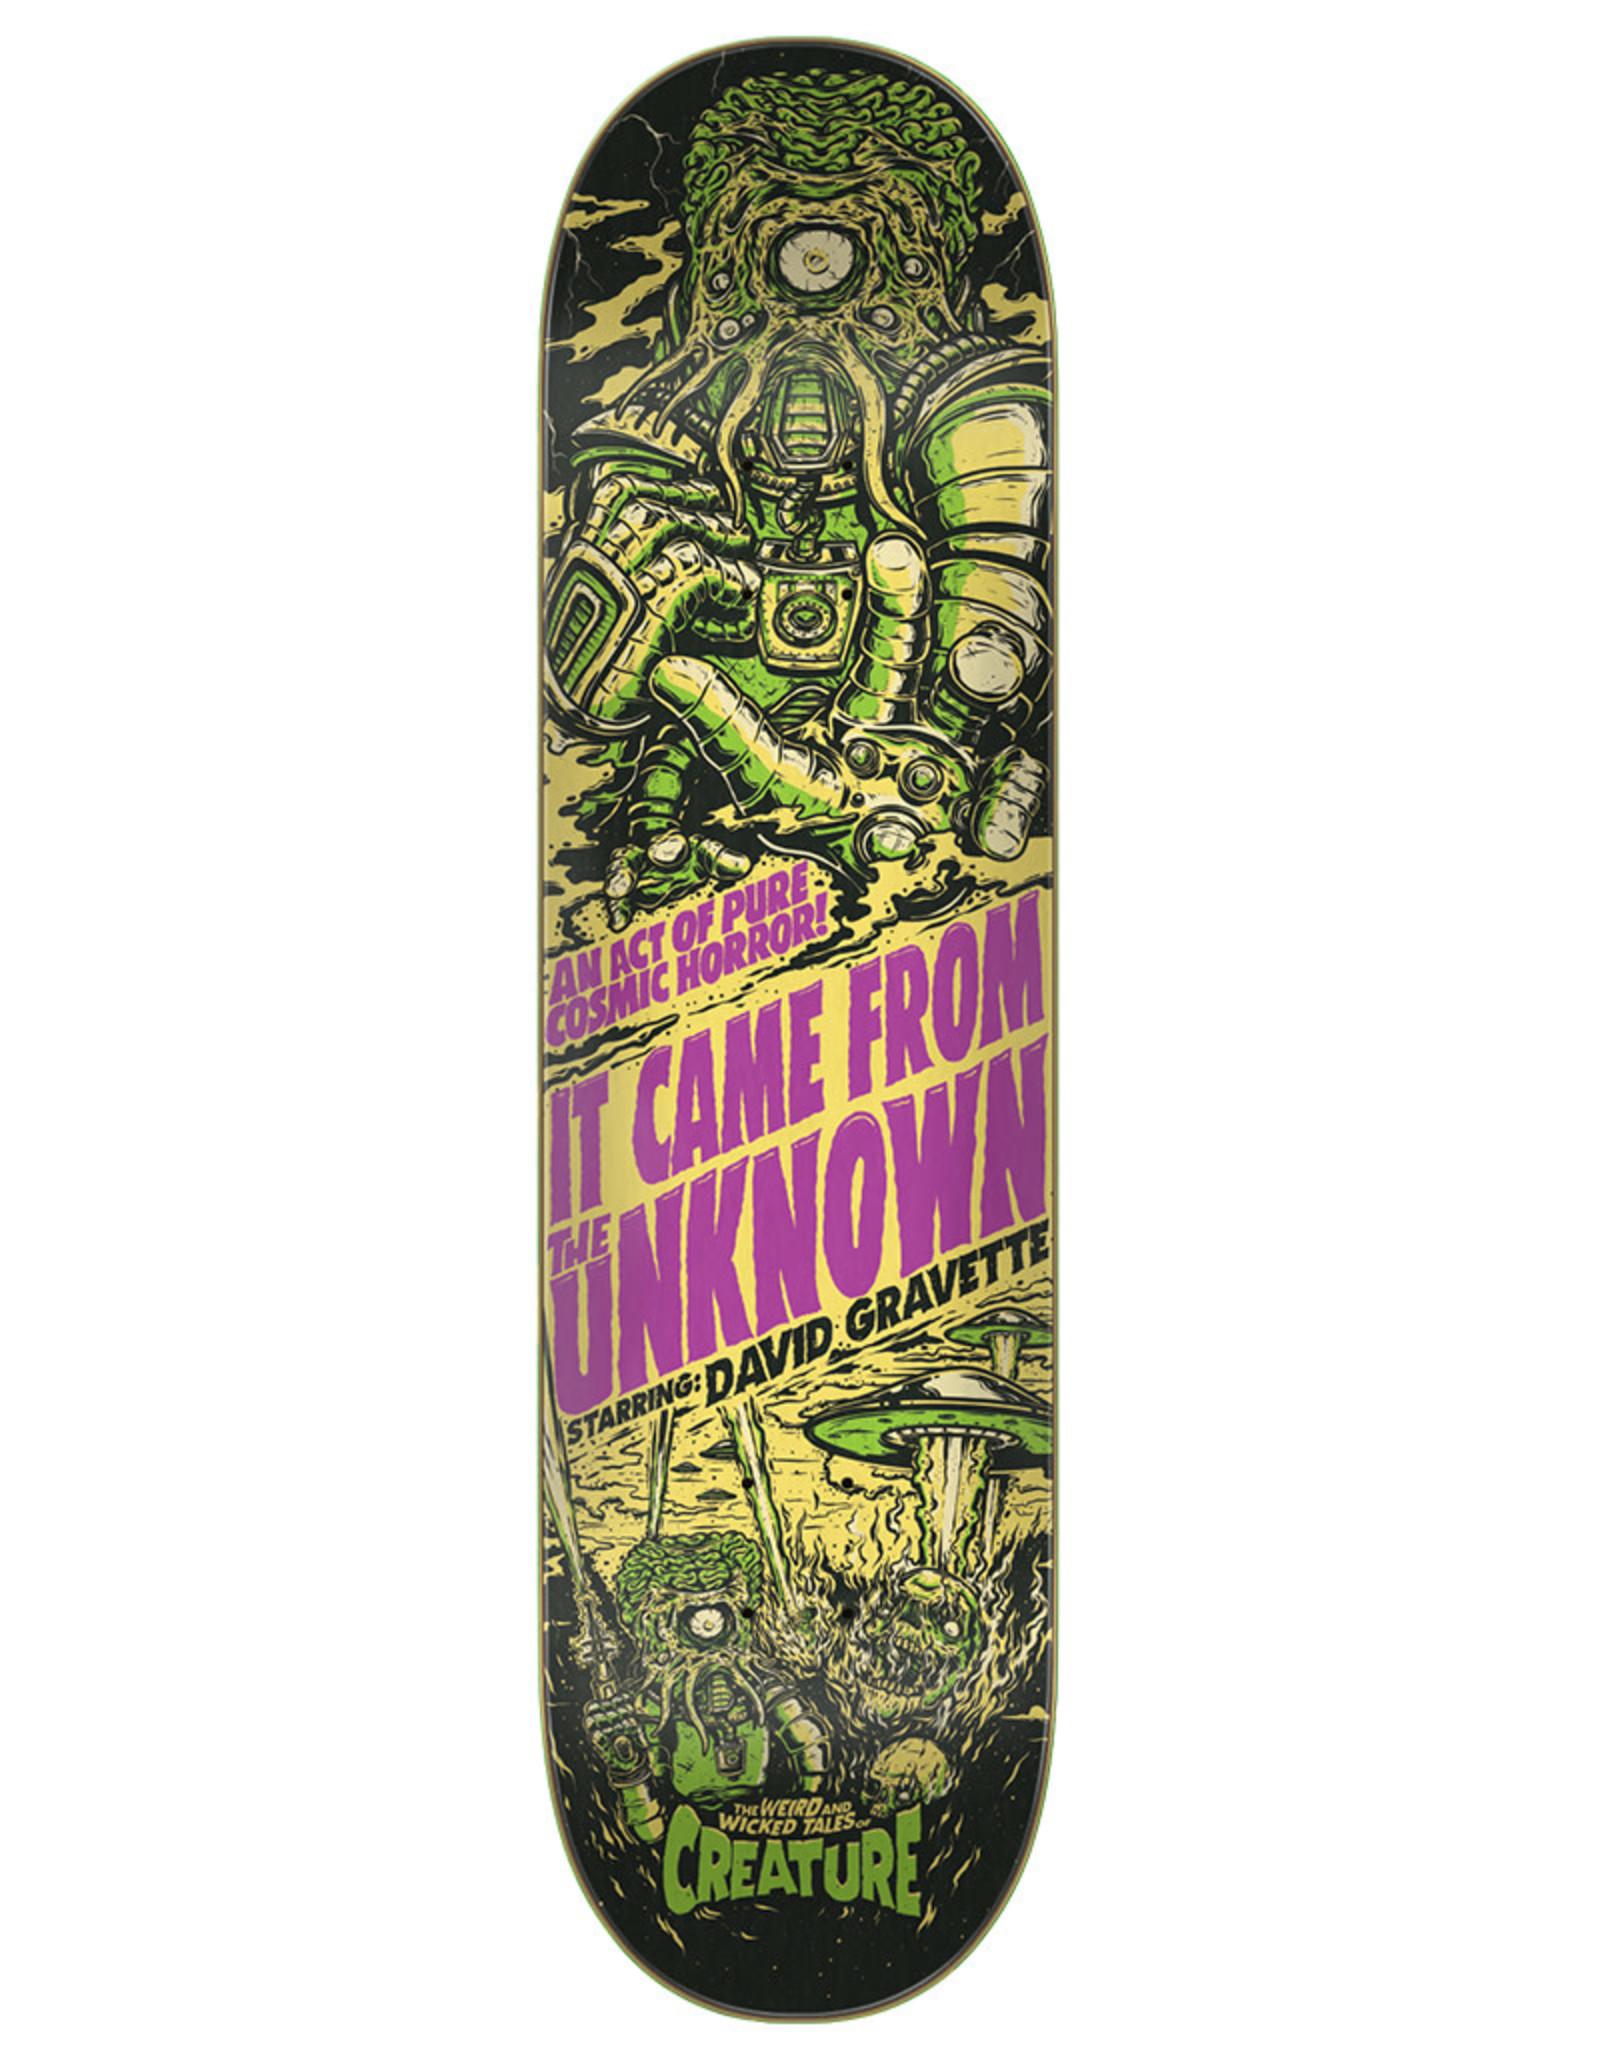 Creature Creature Deck David Gravette Wicked Tales (8.3)